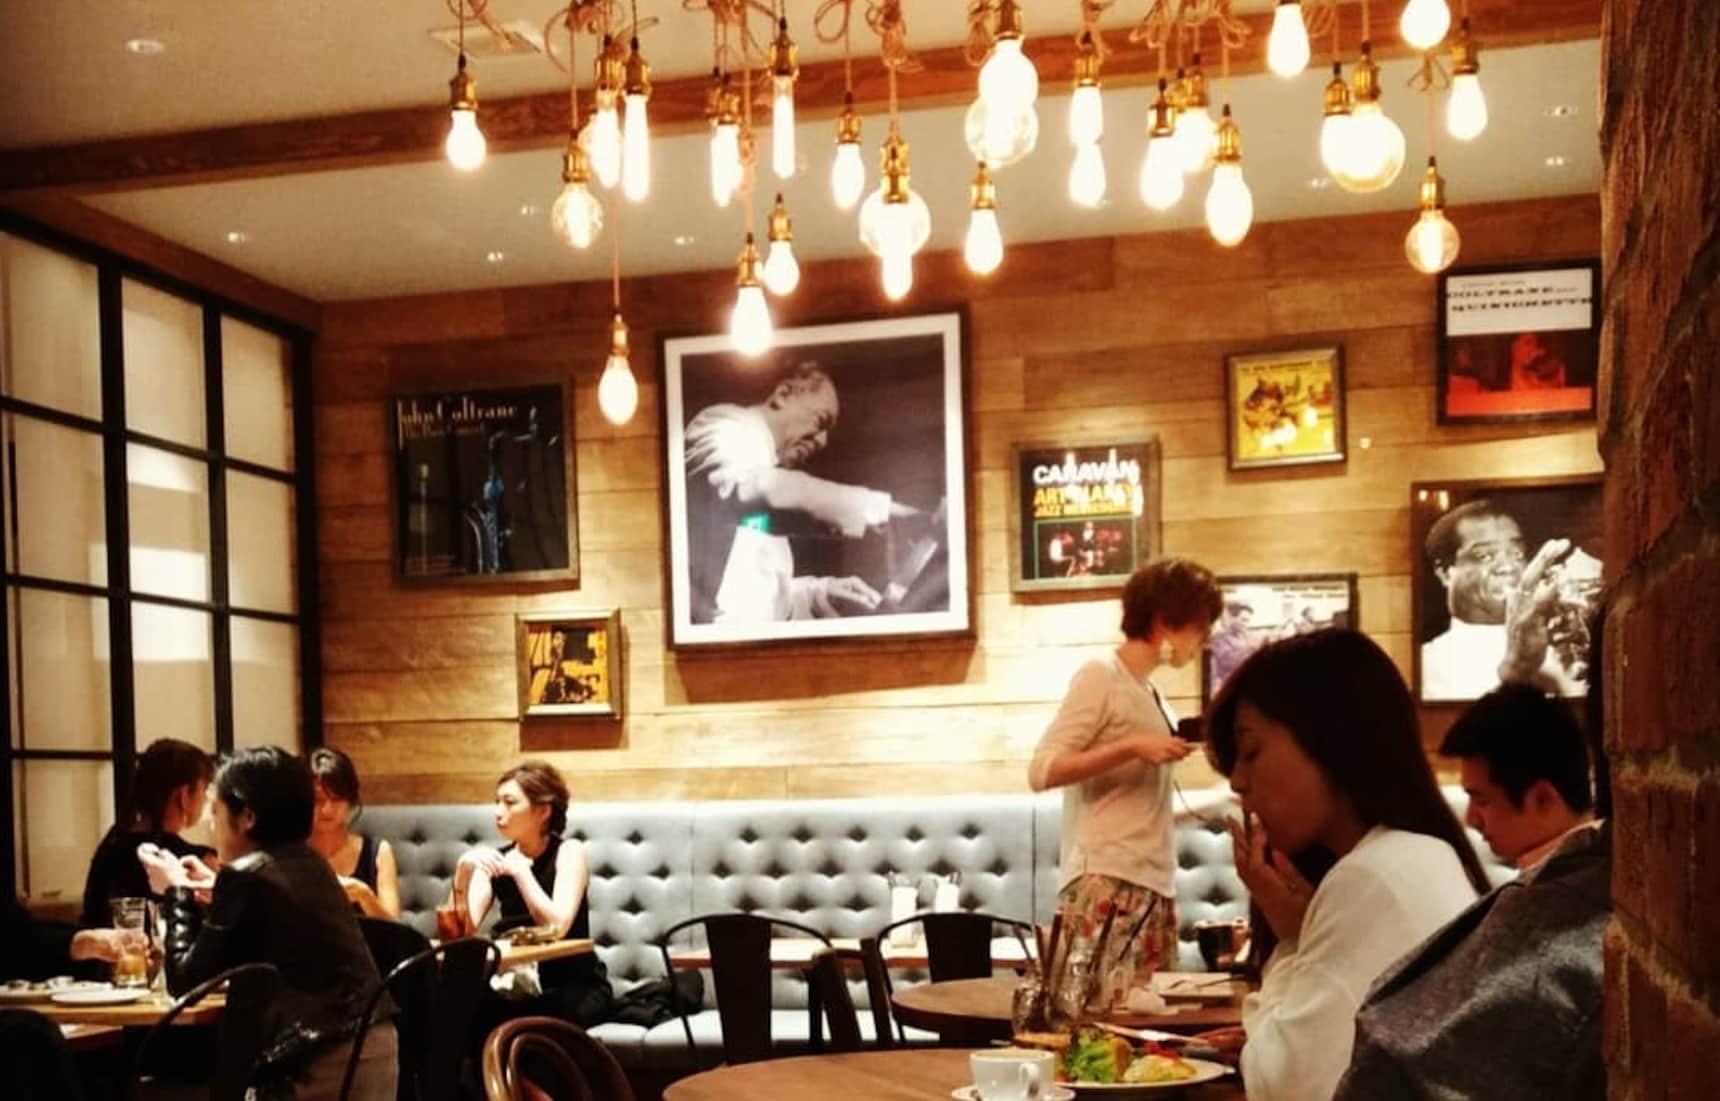 Greater Tokyo: Sightseeing & Gluten-Free Food